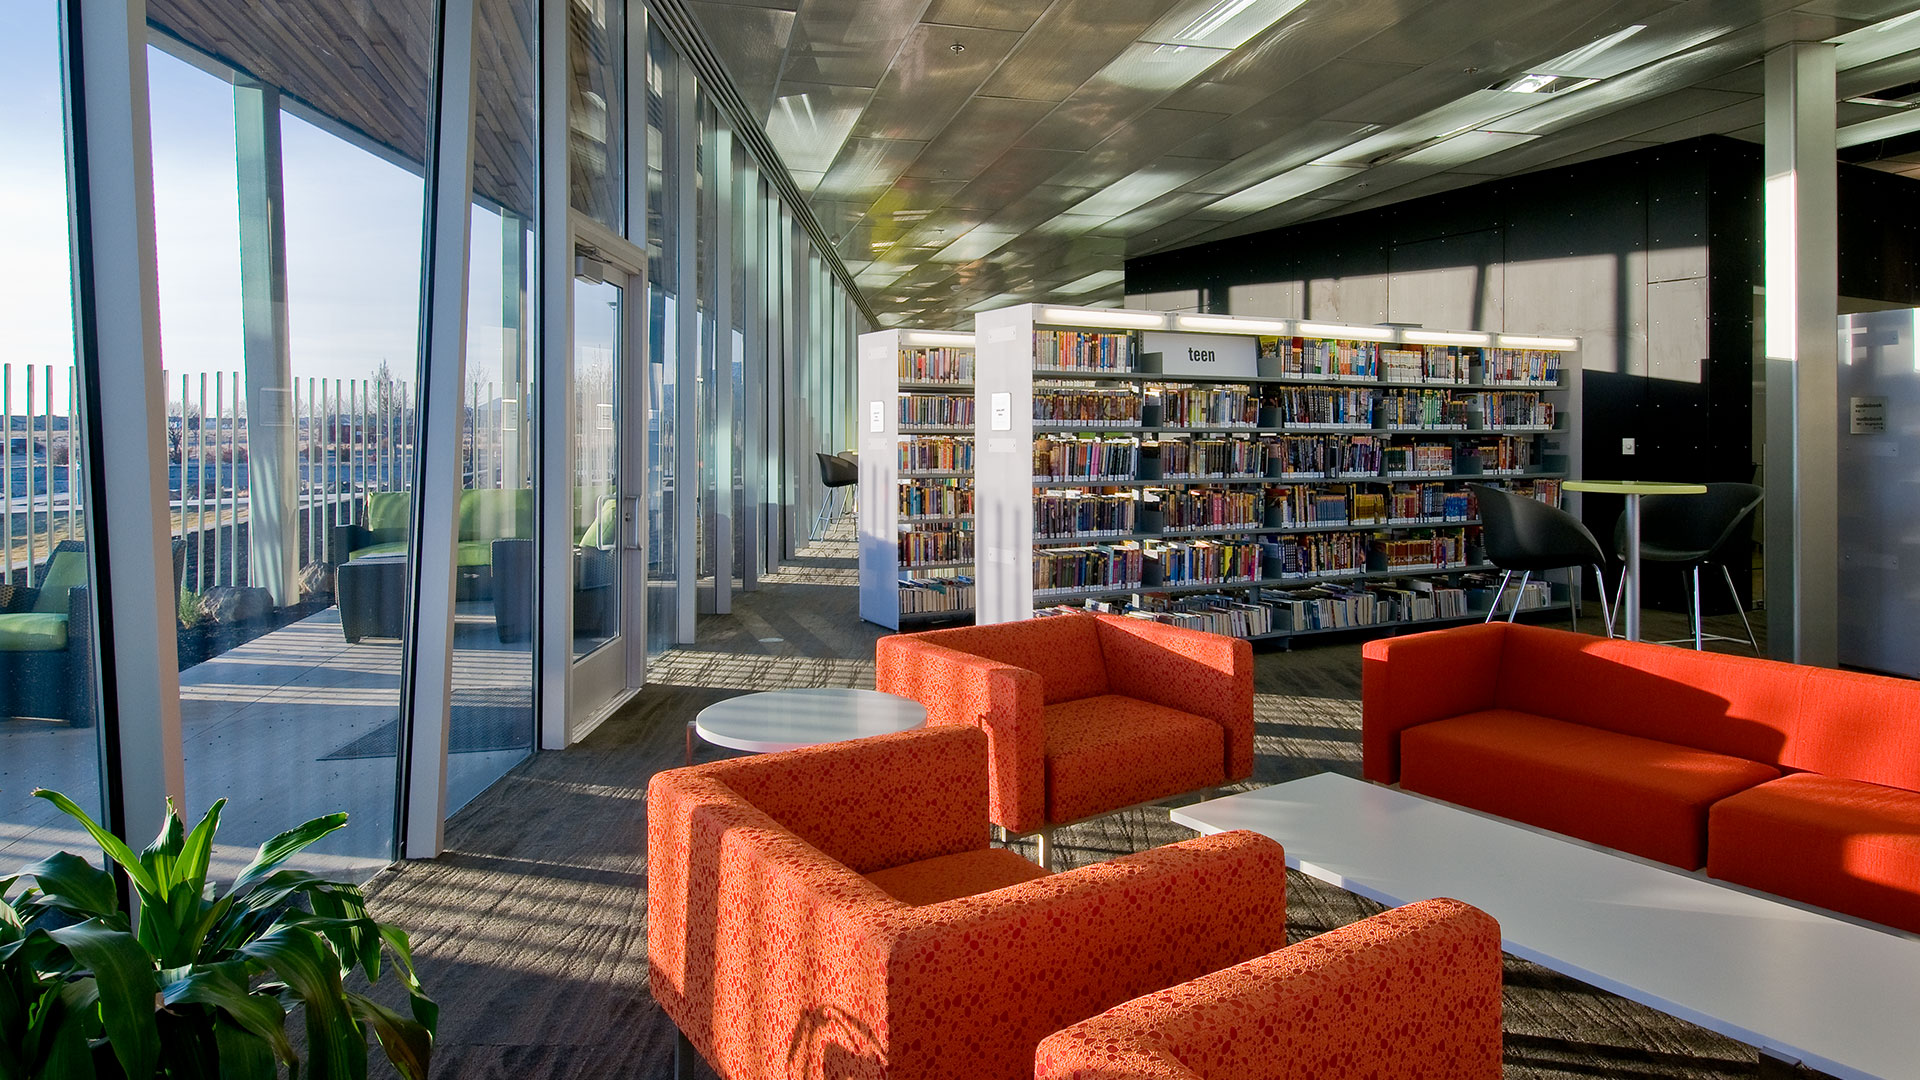 Prescott Valley Library